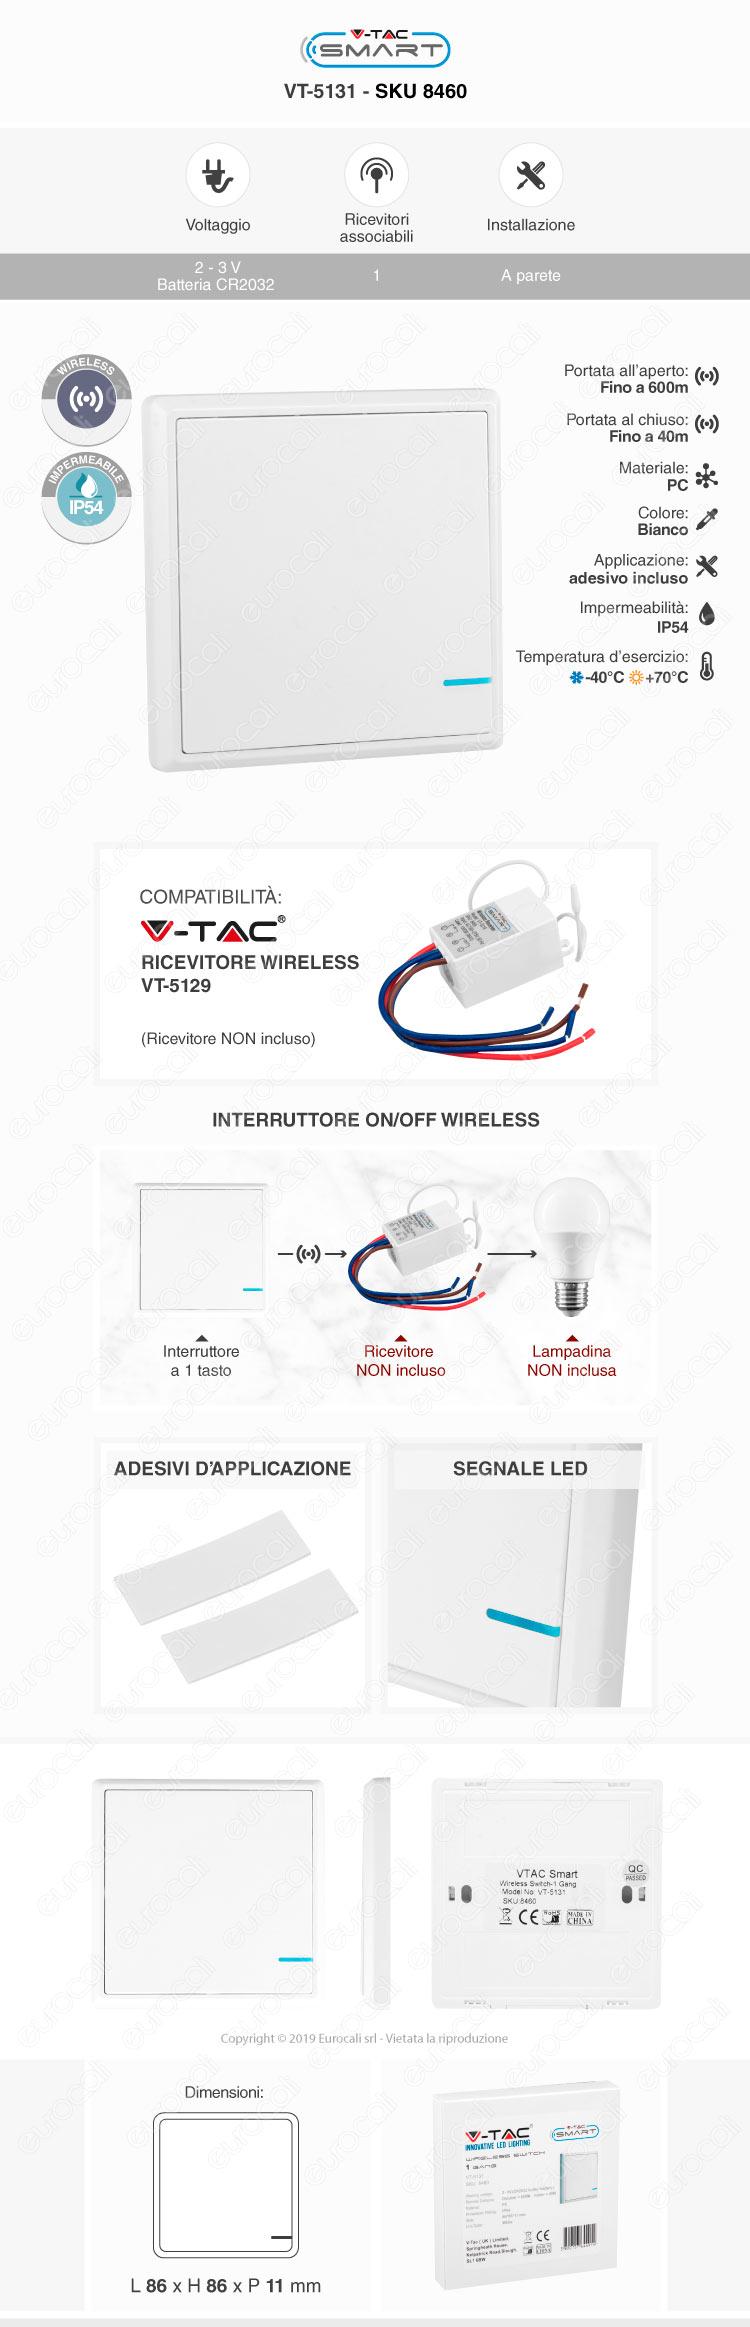 V-Tac VT-5131 Interruttore Wireless 1 Gang Senza Fili con Luce LED IP54